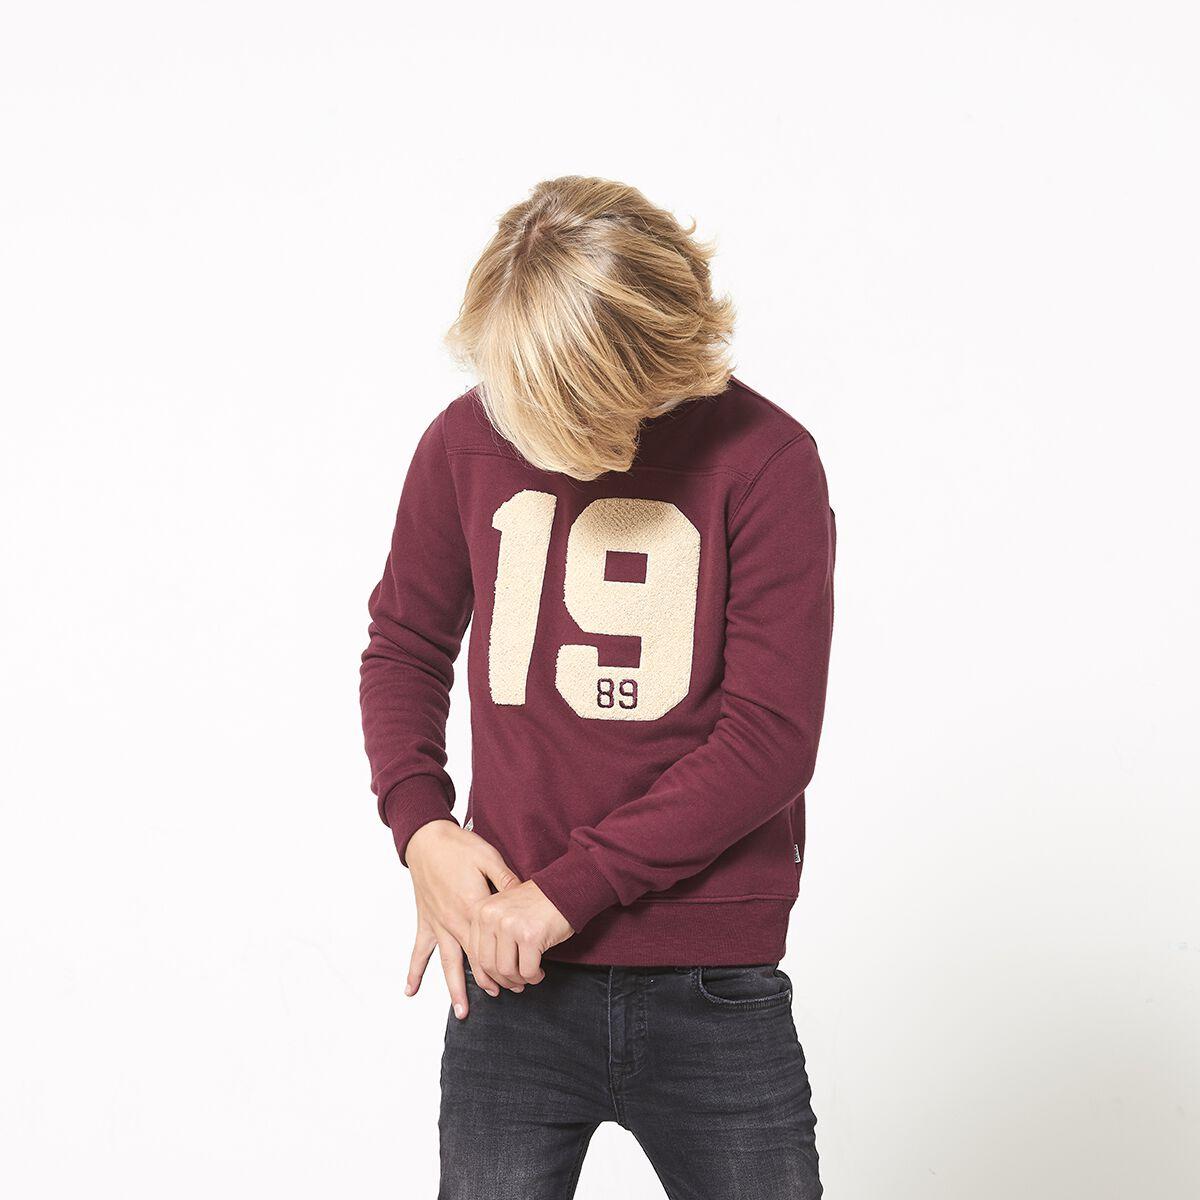 Sweater Stef Jr.